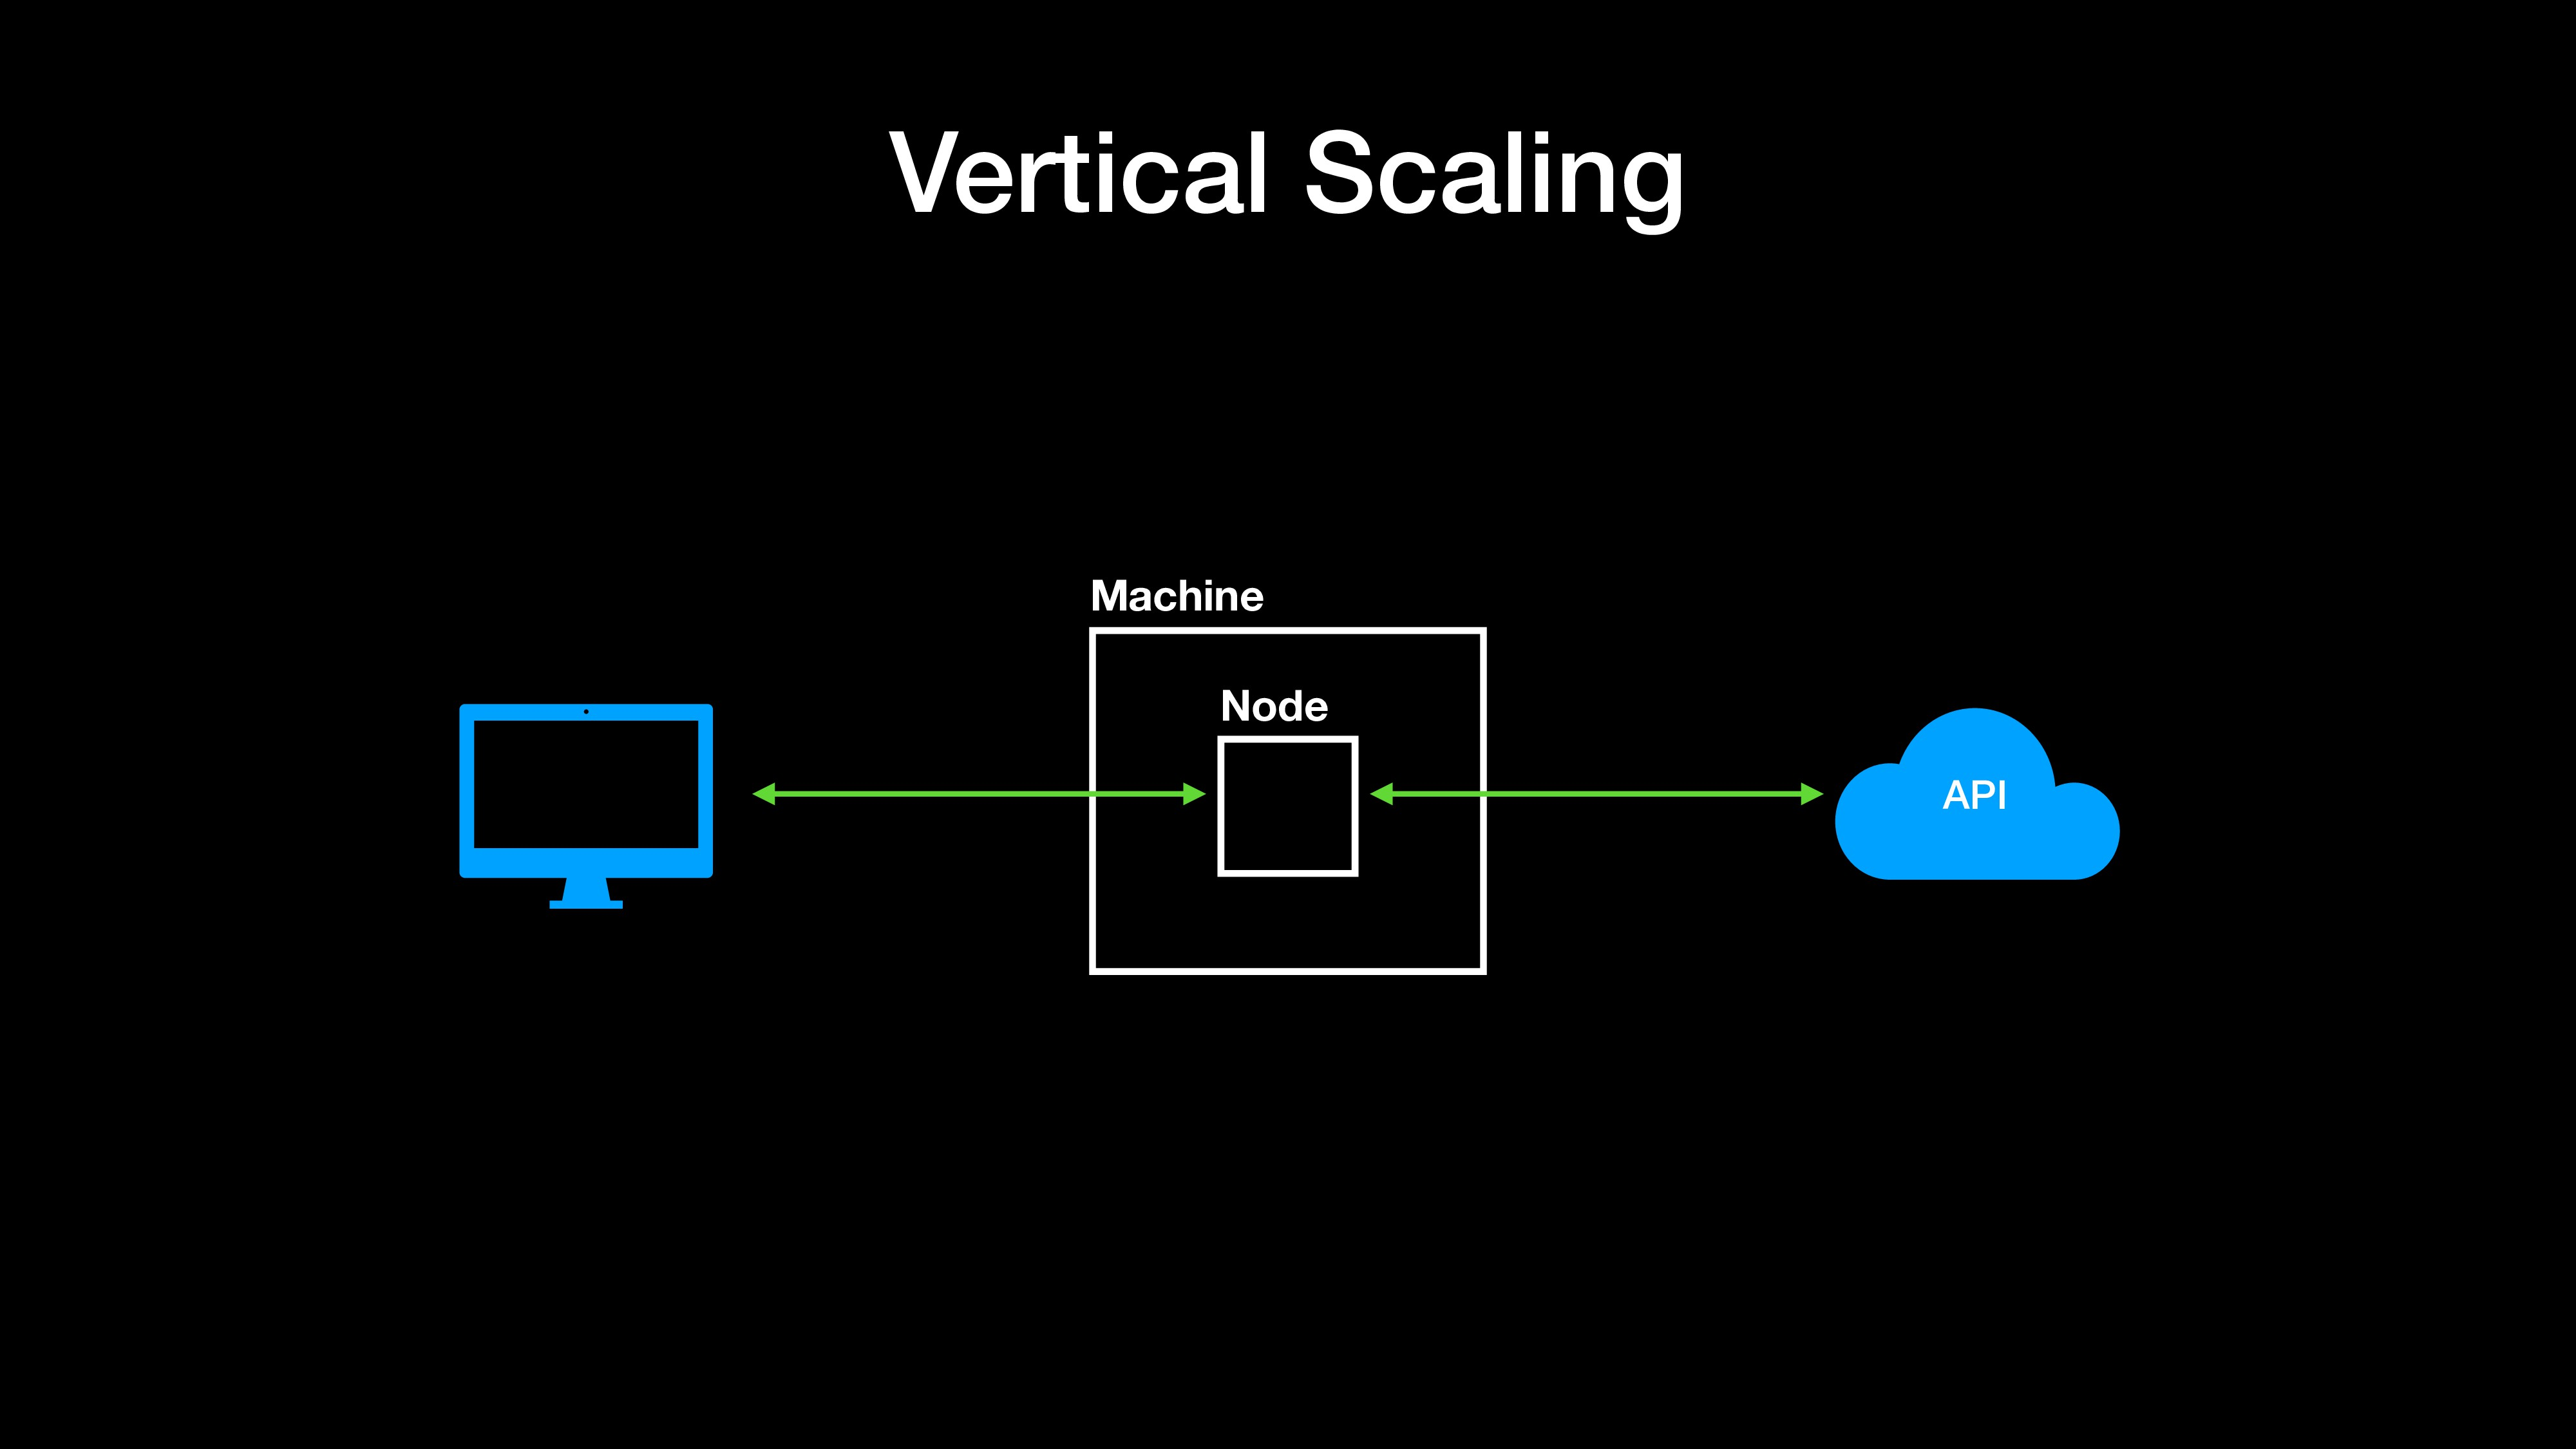 Vertical Scaling Machine Node API